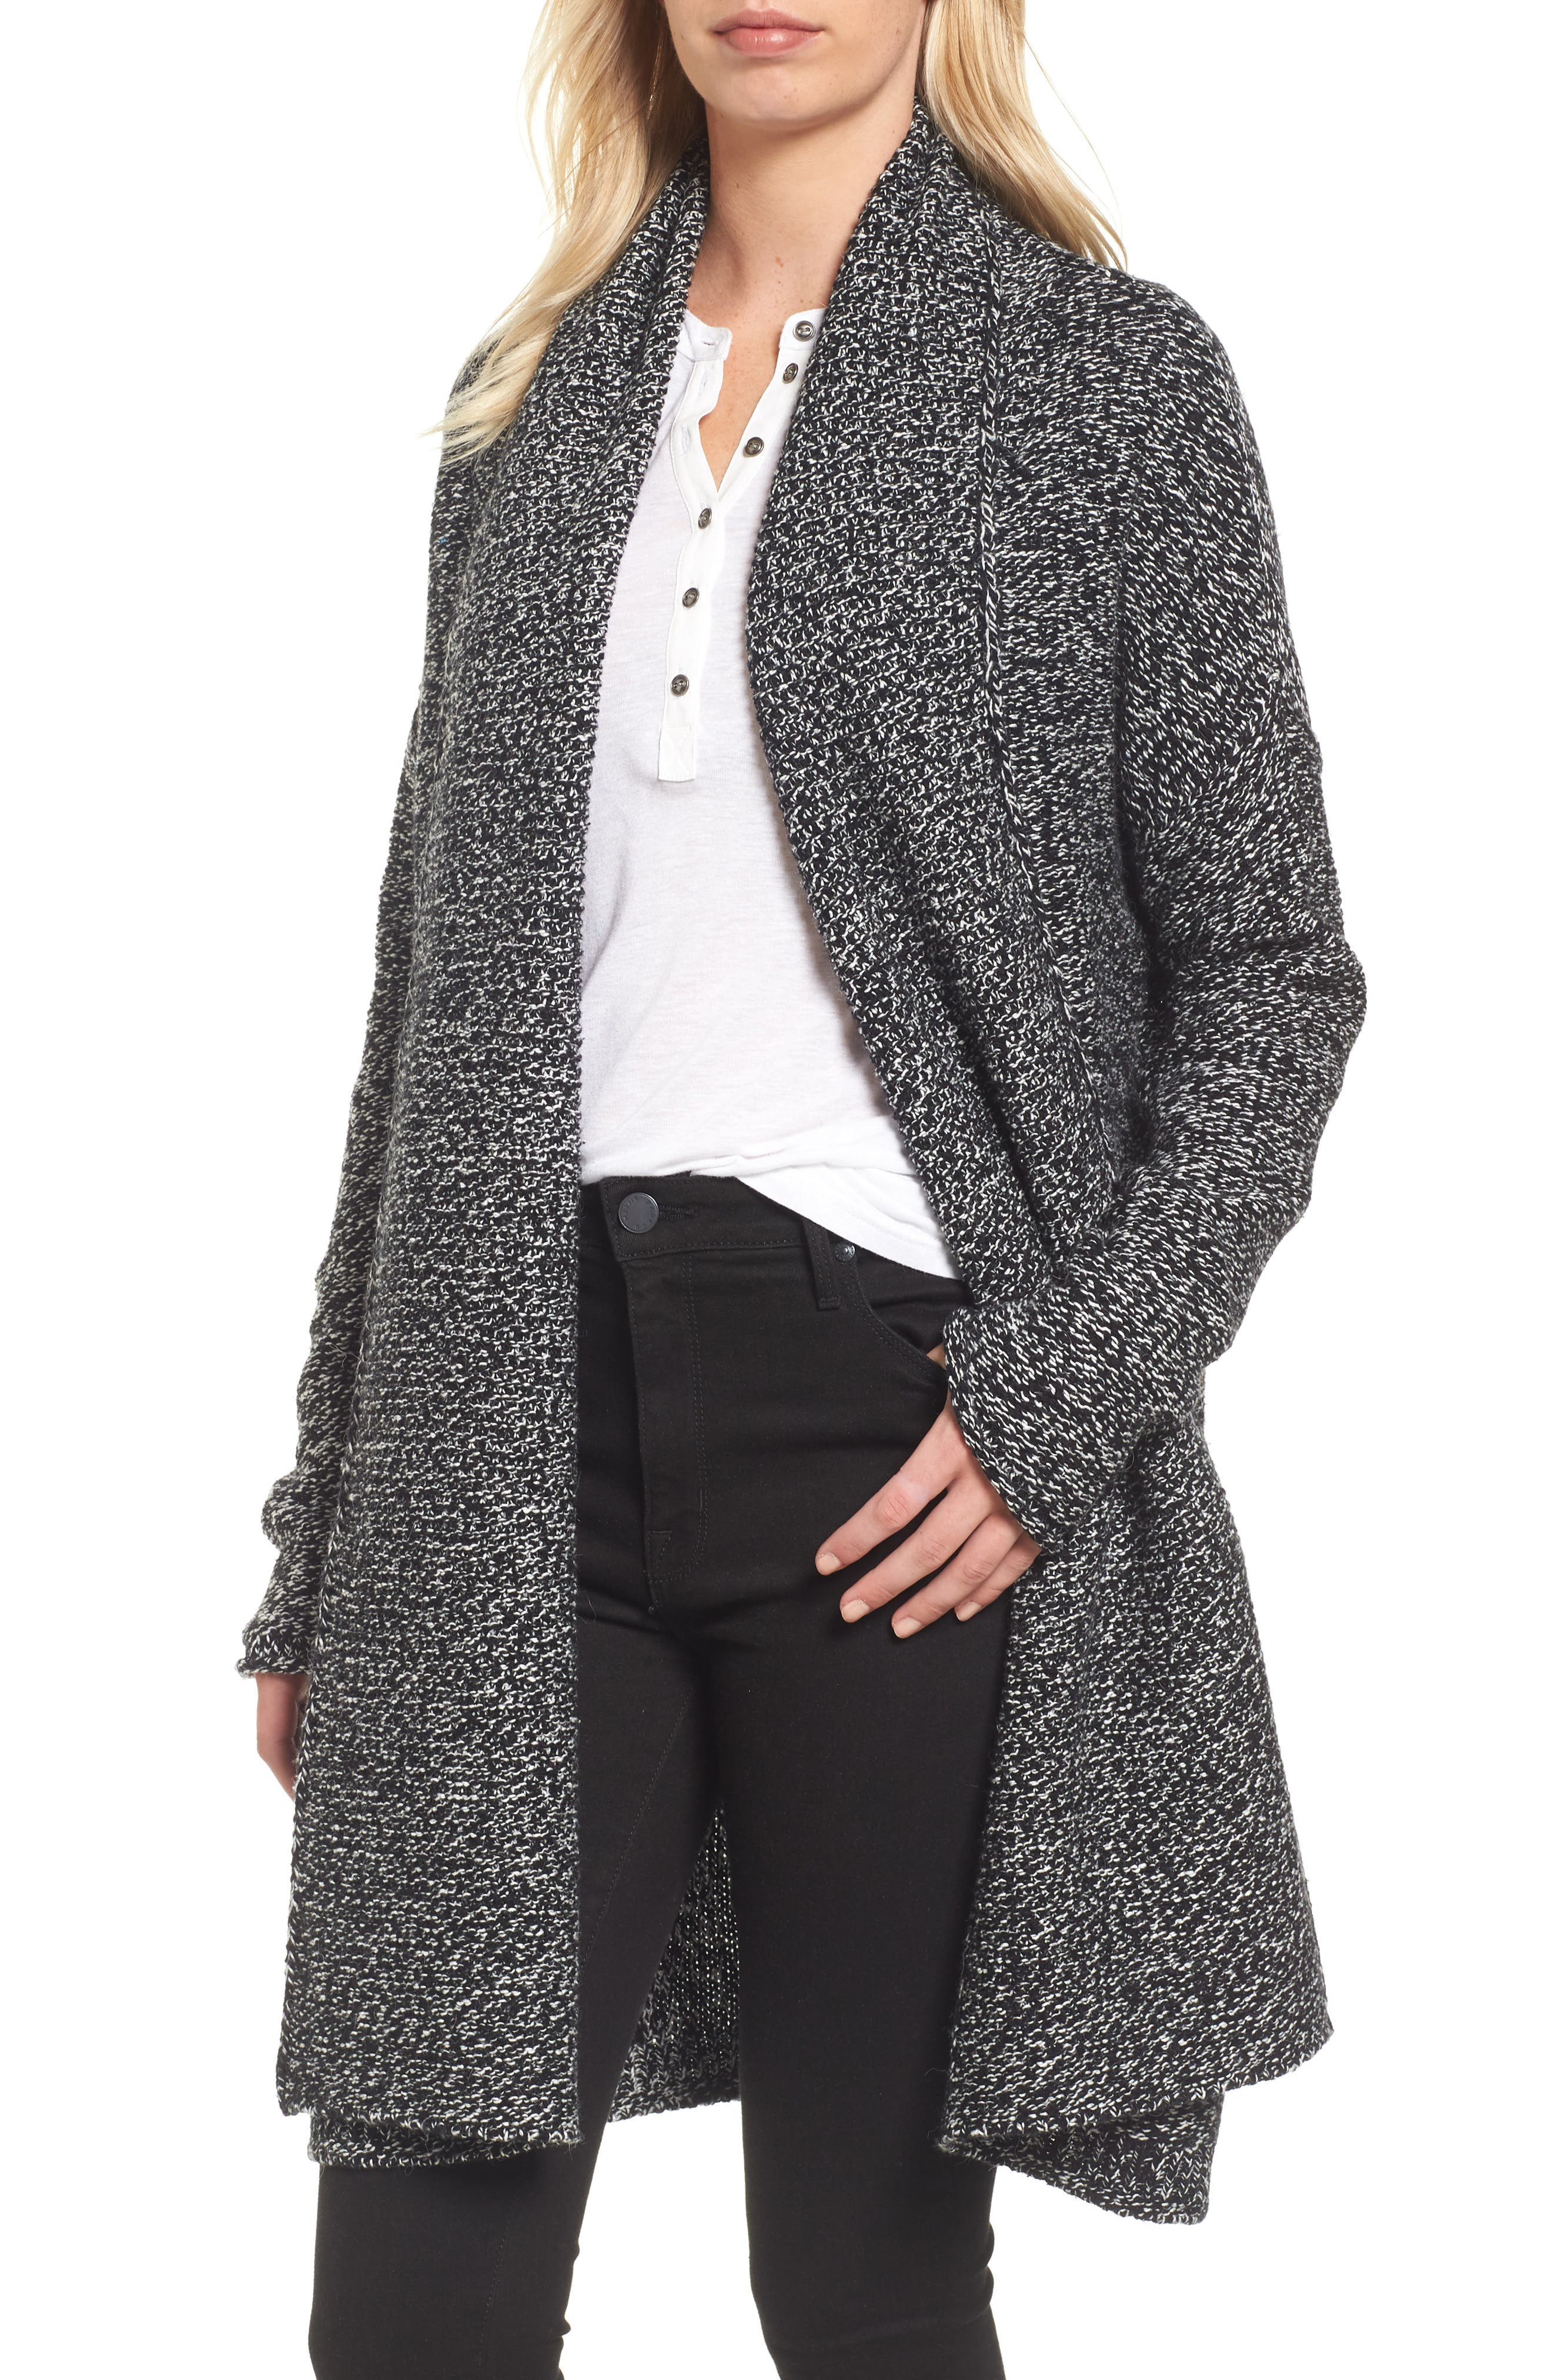 Alternate Image 1 Selected - Caslon® Shawl Collar Cardigan (Regular & Petite)